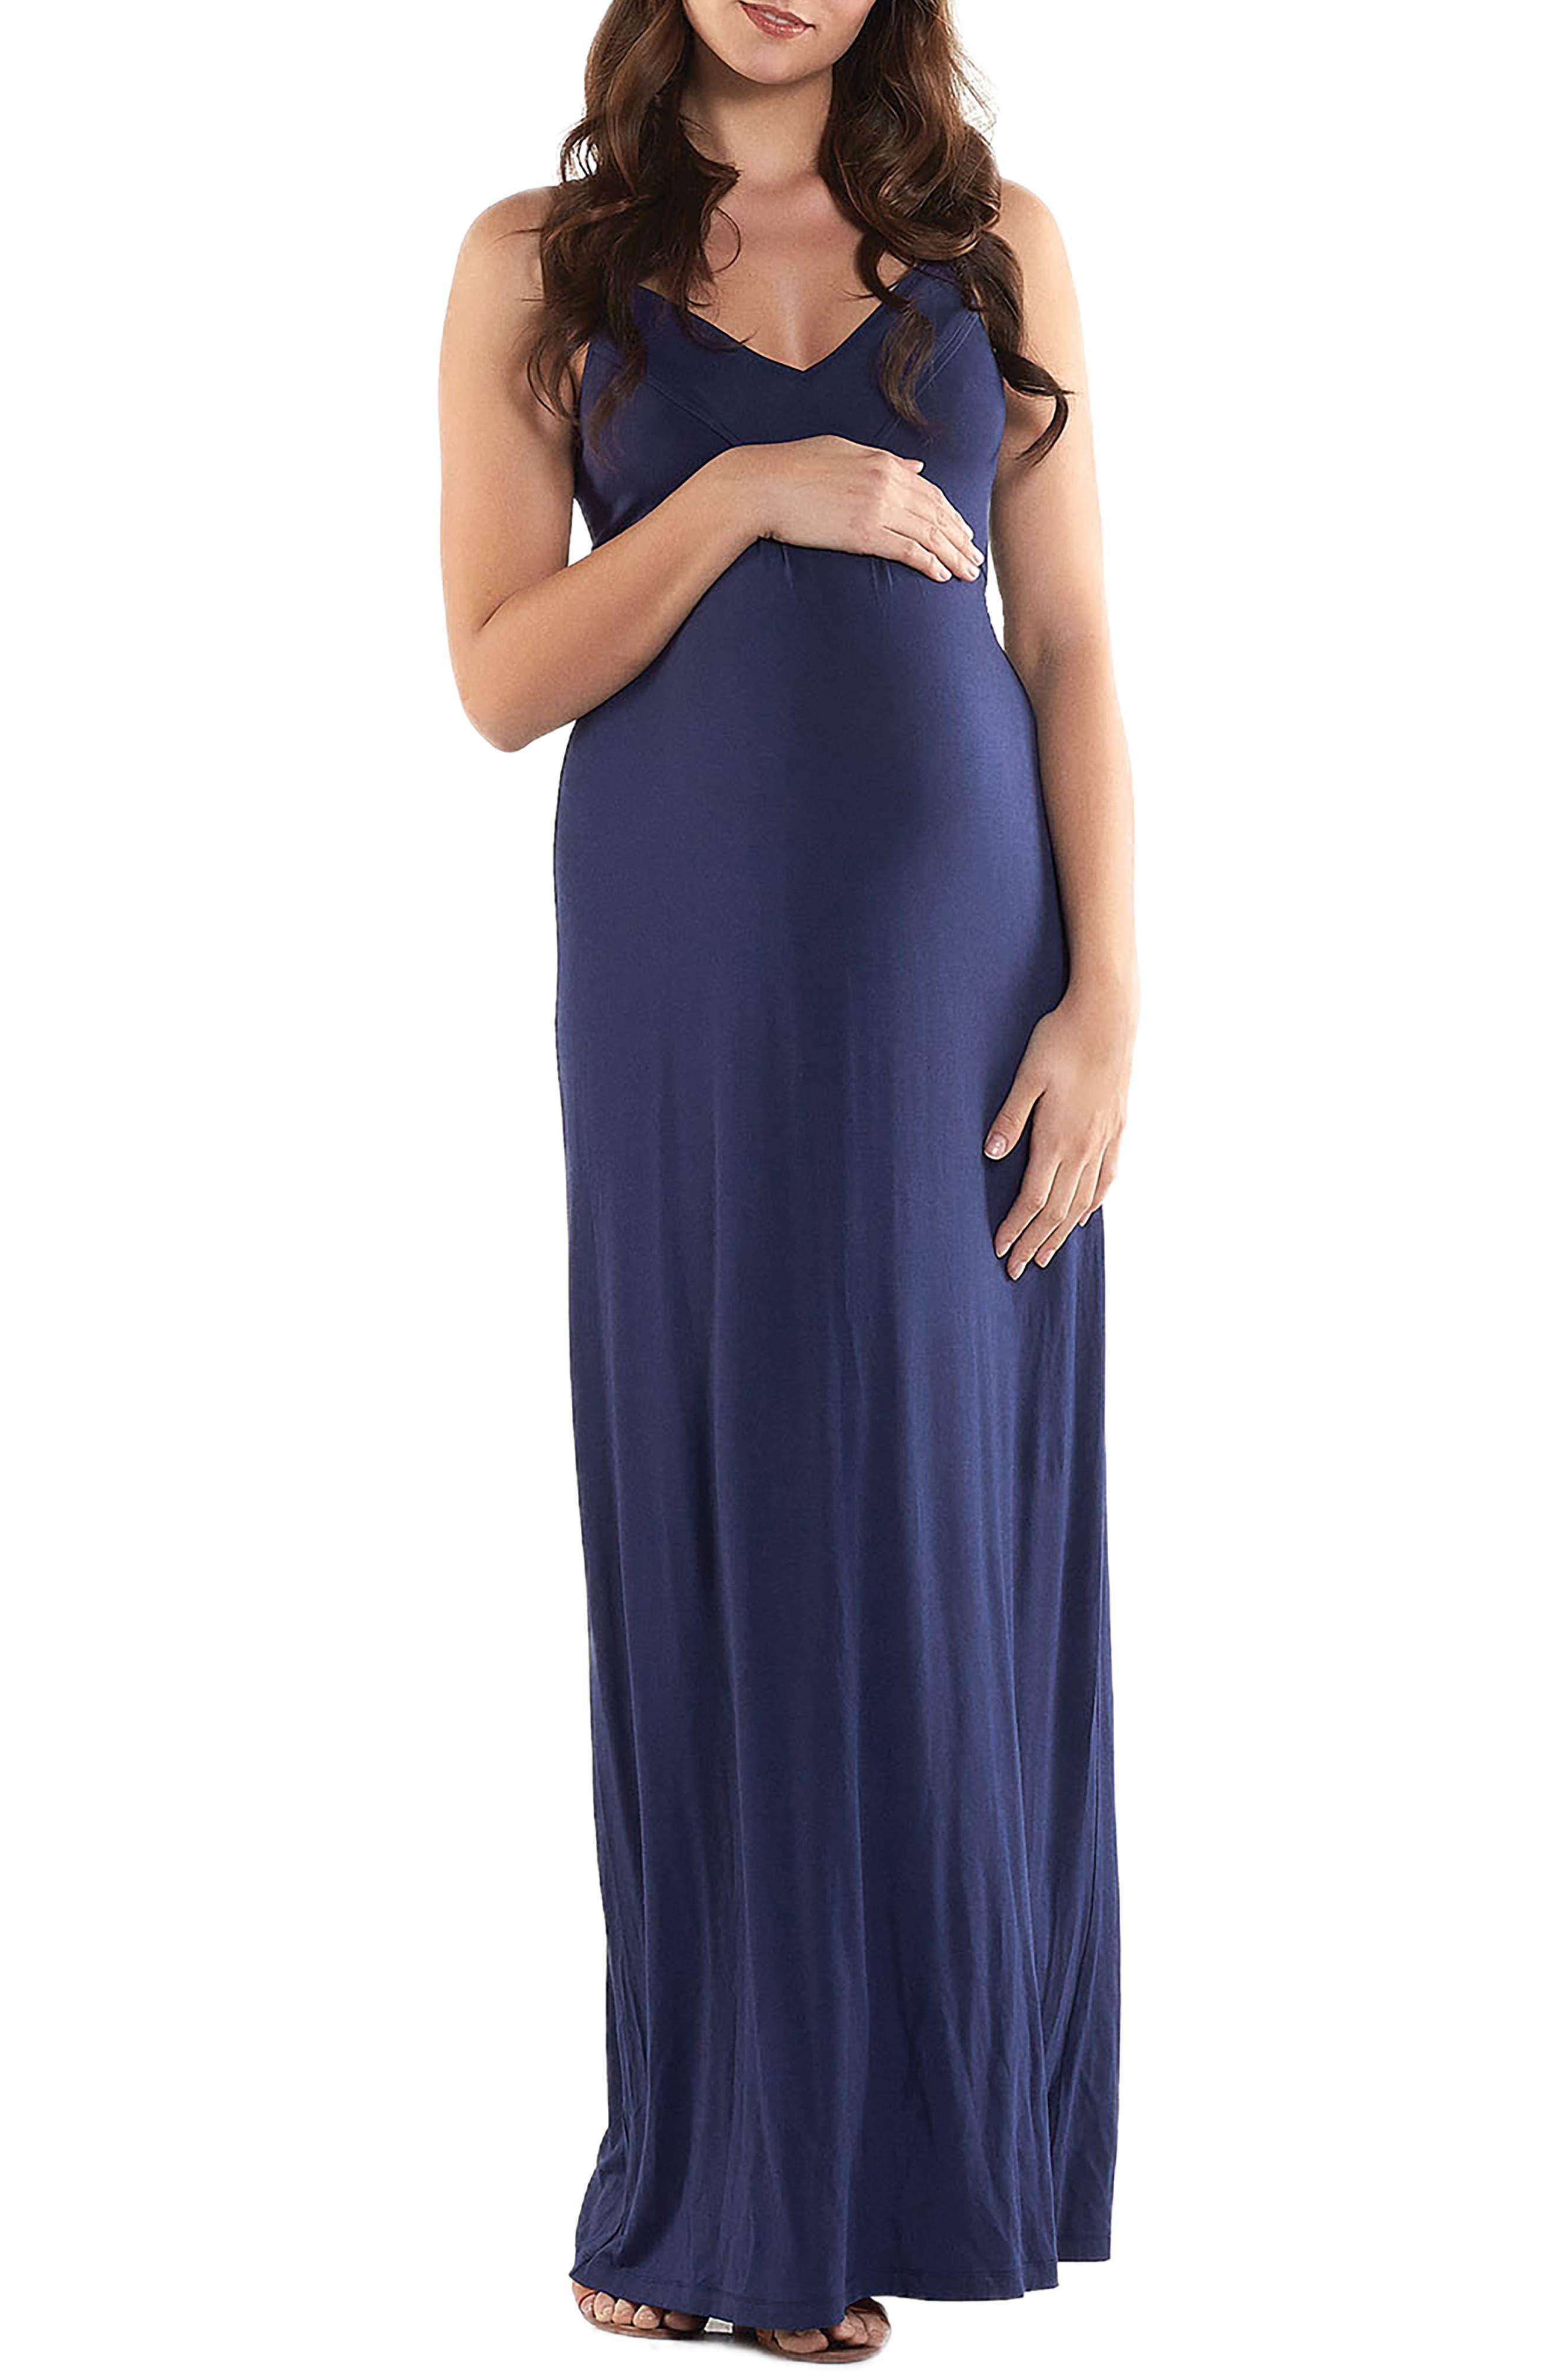 'Lynelle' Maternity Maxi Dress,                             Main thumbnail 1, color,                             PEACOAT